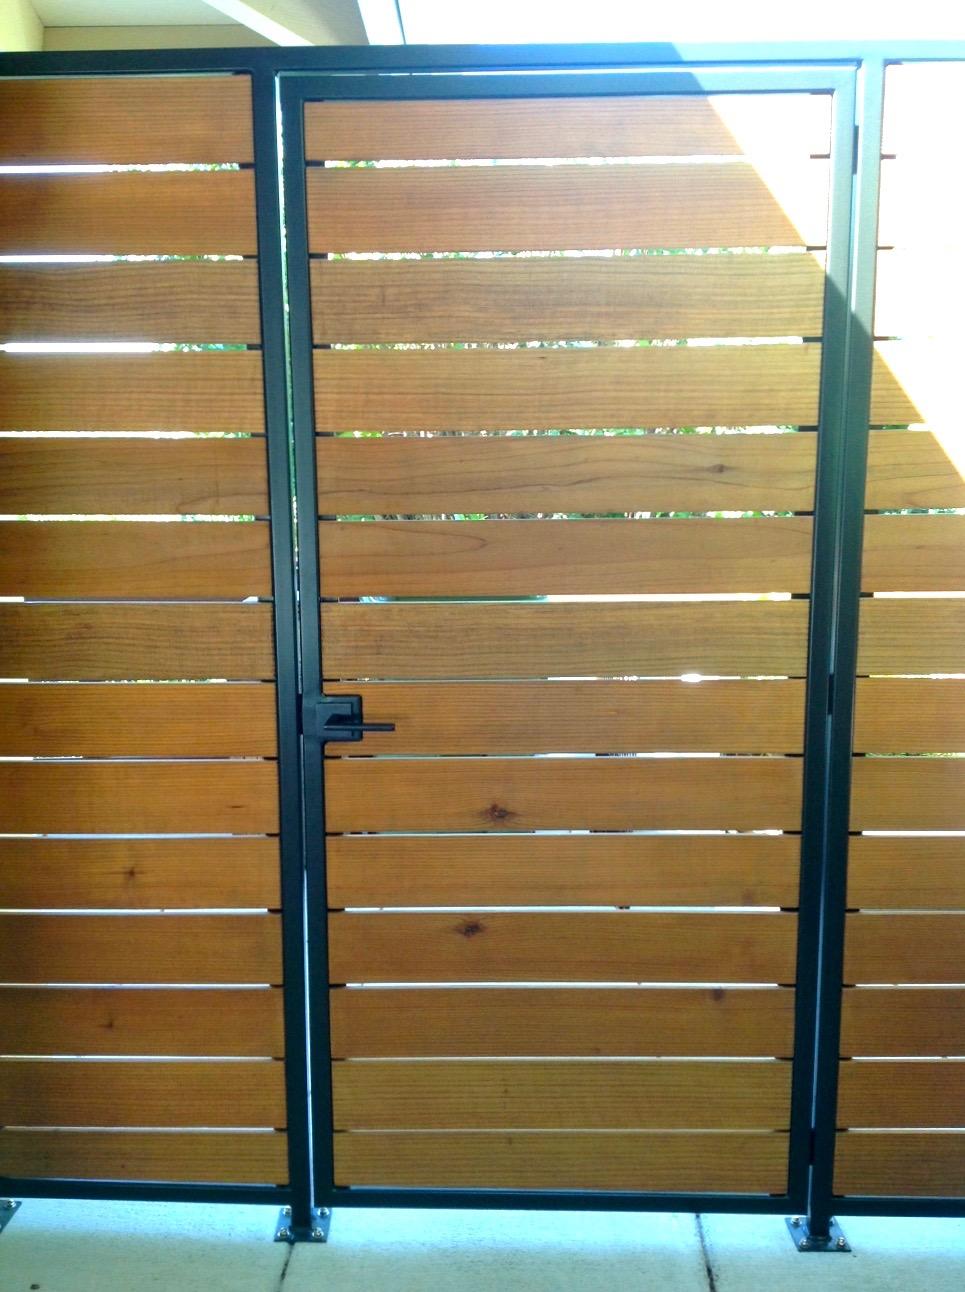 CORTE MADERA STEEL: IPE GATE